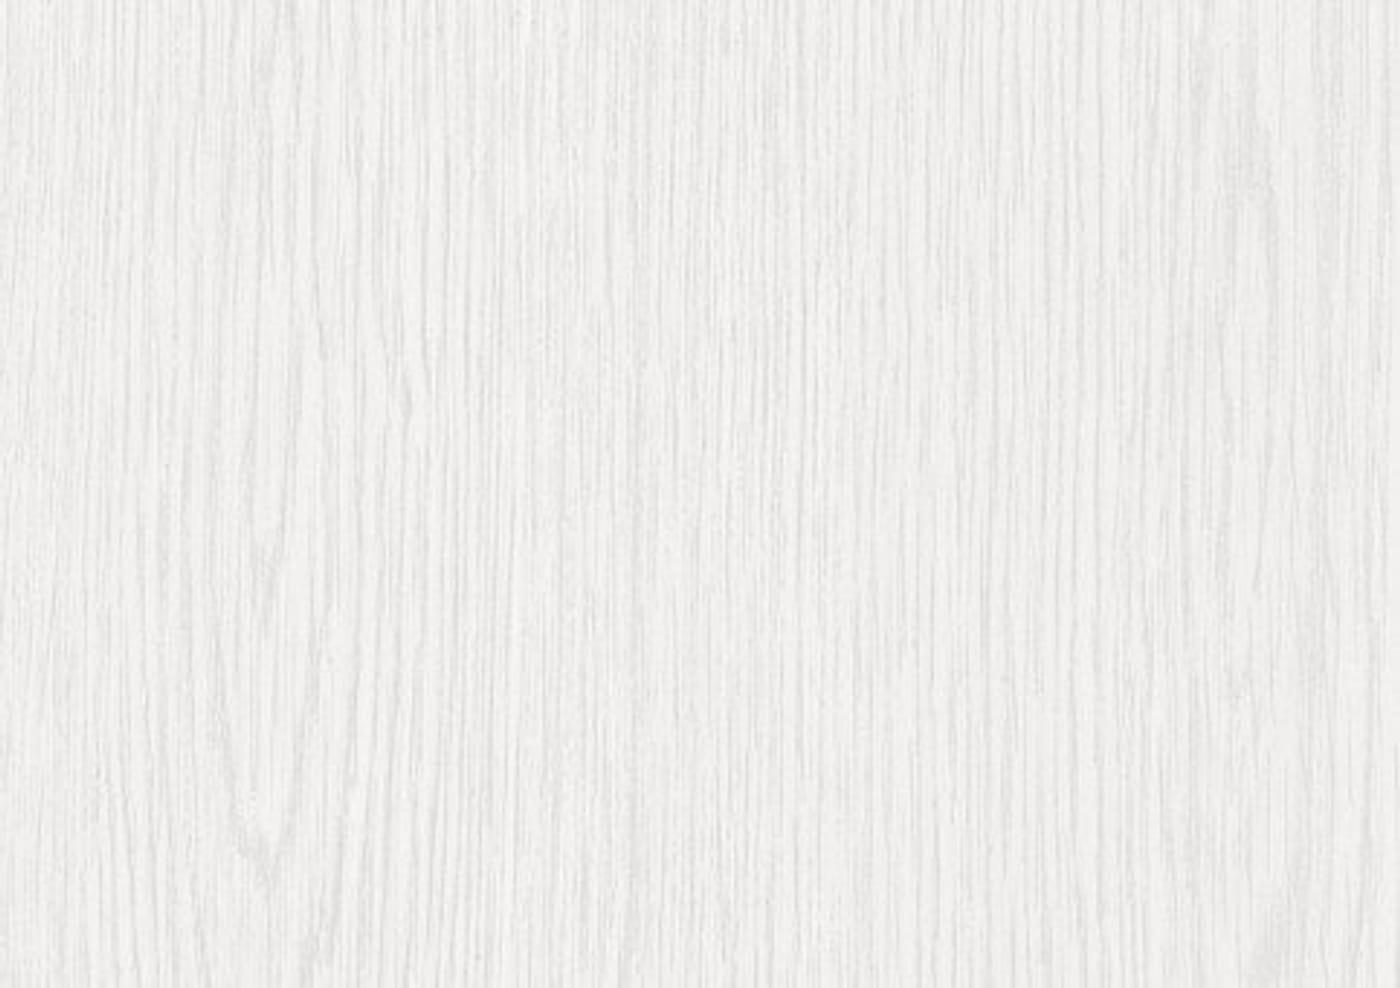 D c fix dekofolien selbstklebend whitewood migros for Dekofolien selbstklebend